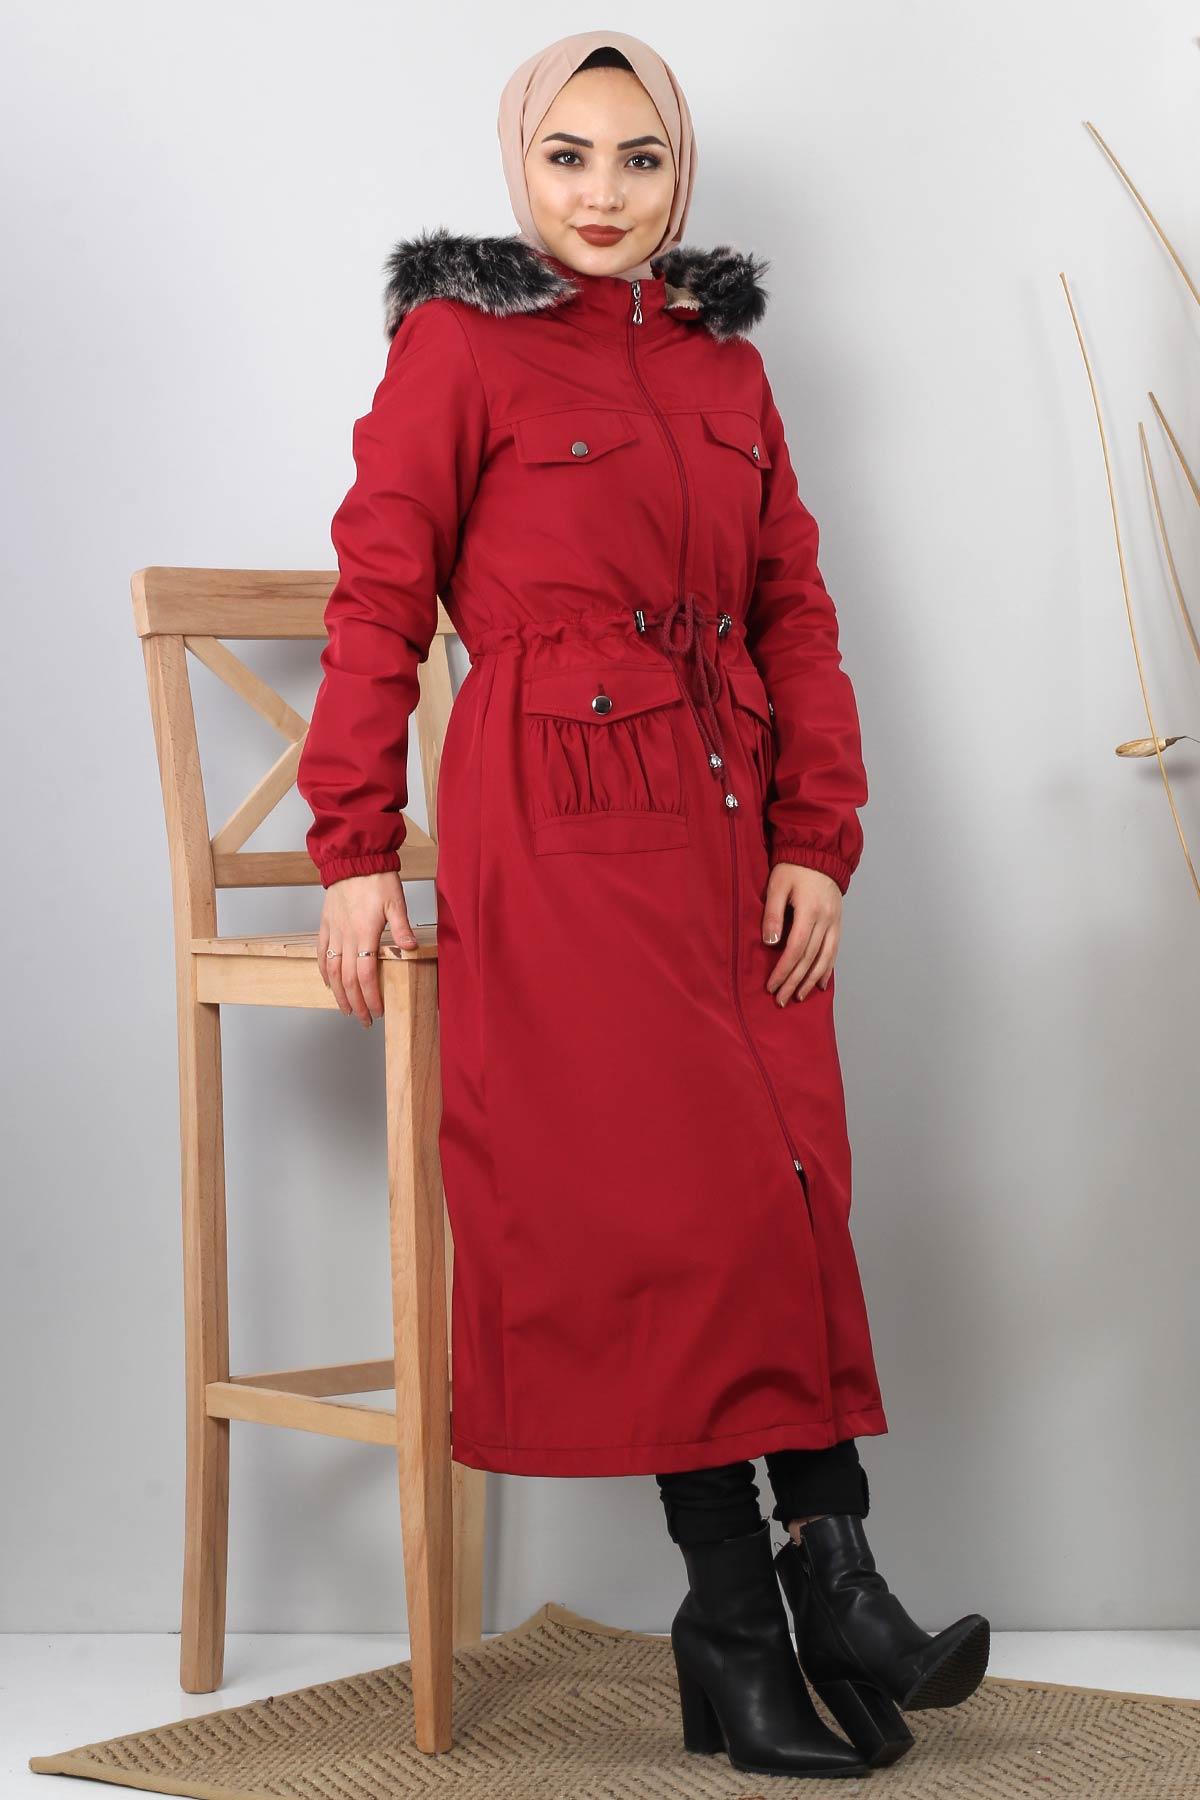 Pocket Detailed Fur Inside Coat TSD8906 Claret Red